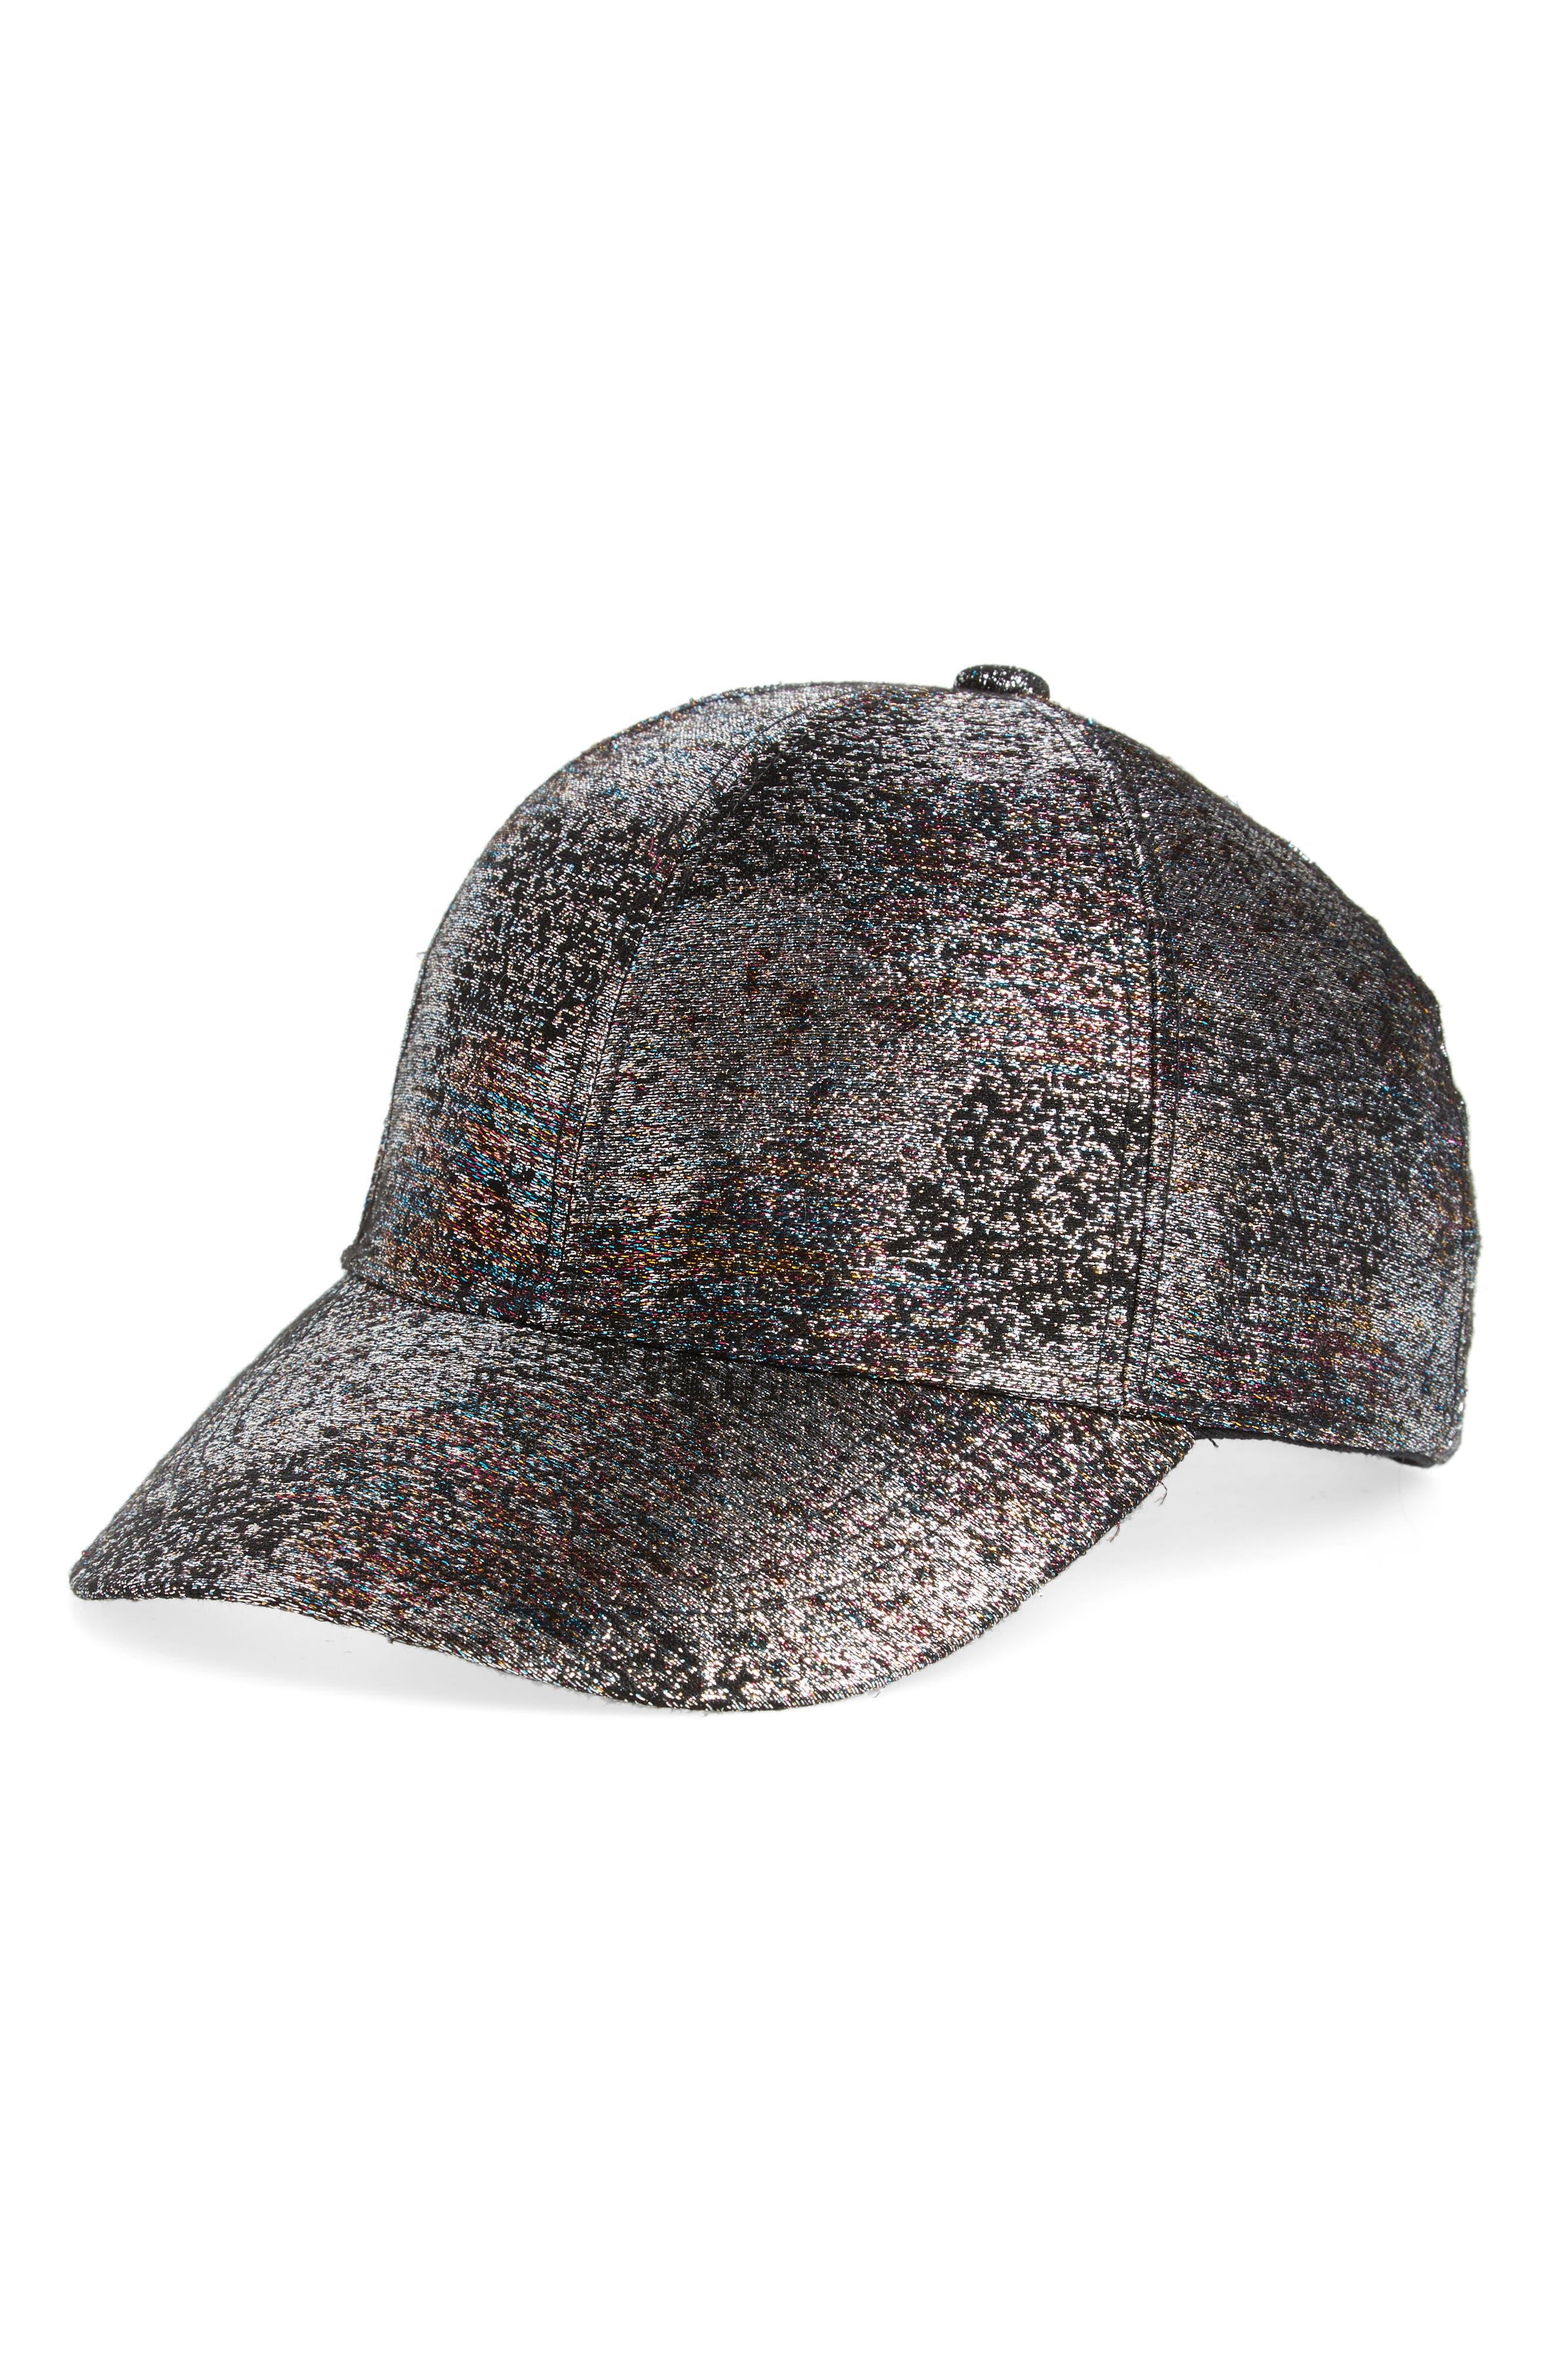 Iridescent Baseball Cap,                         Main,                         color, Multi